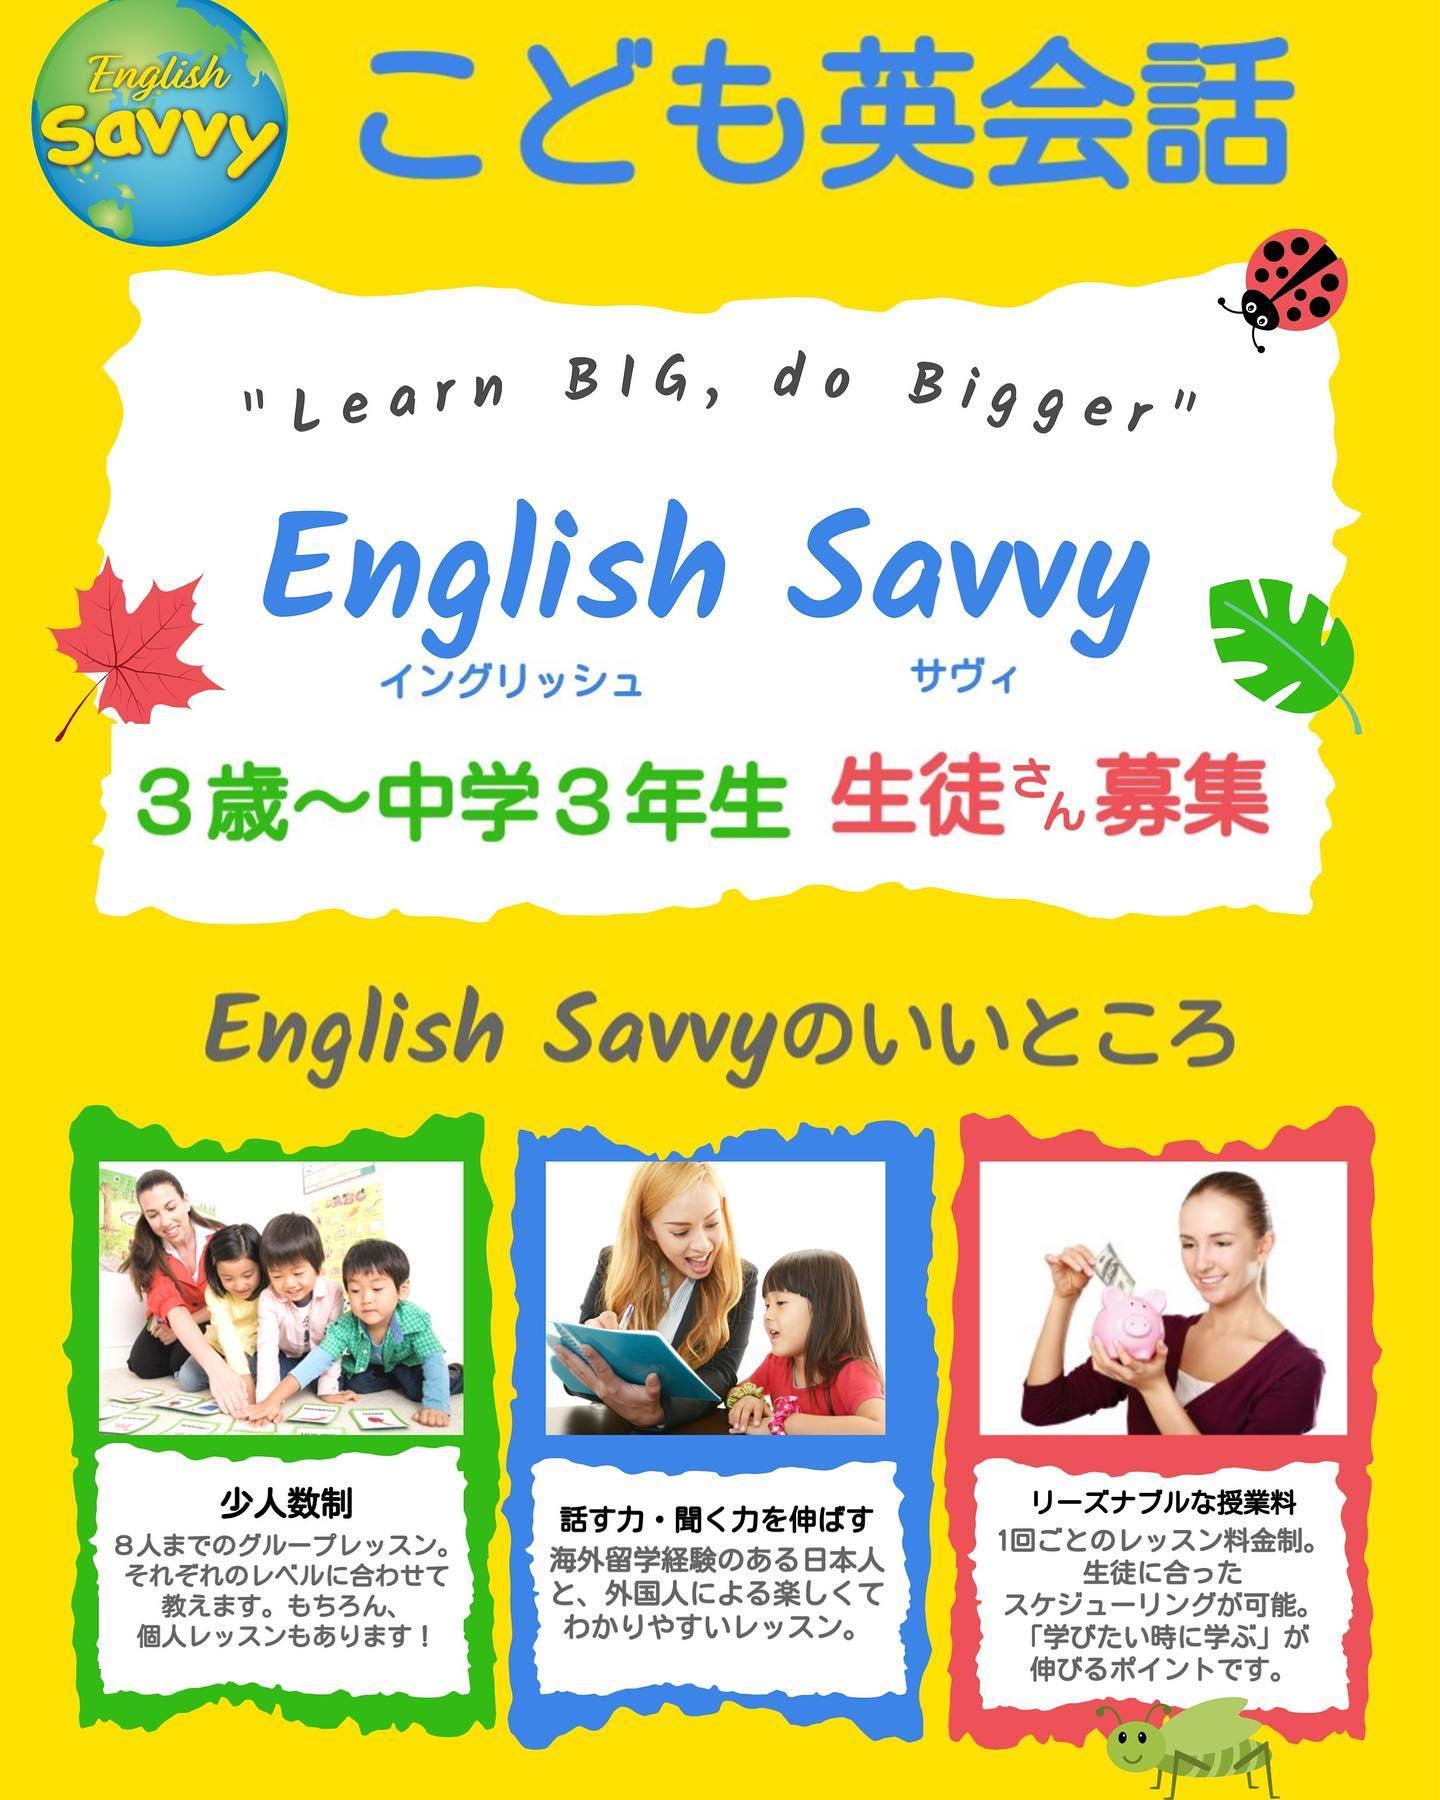 English Savvy Blog from Instagram